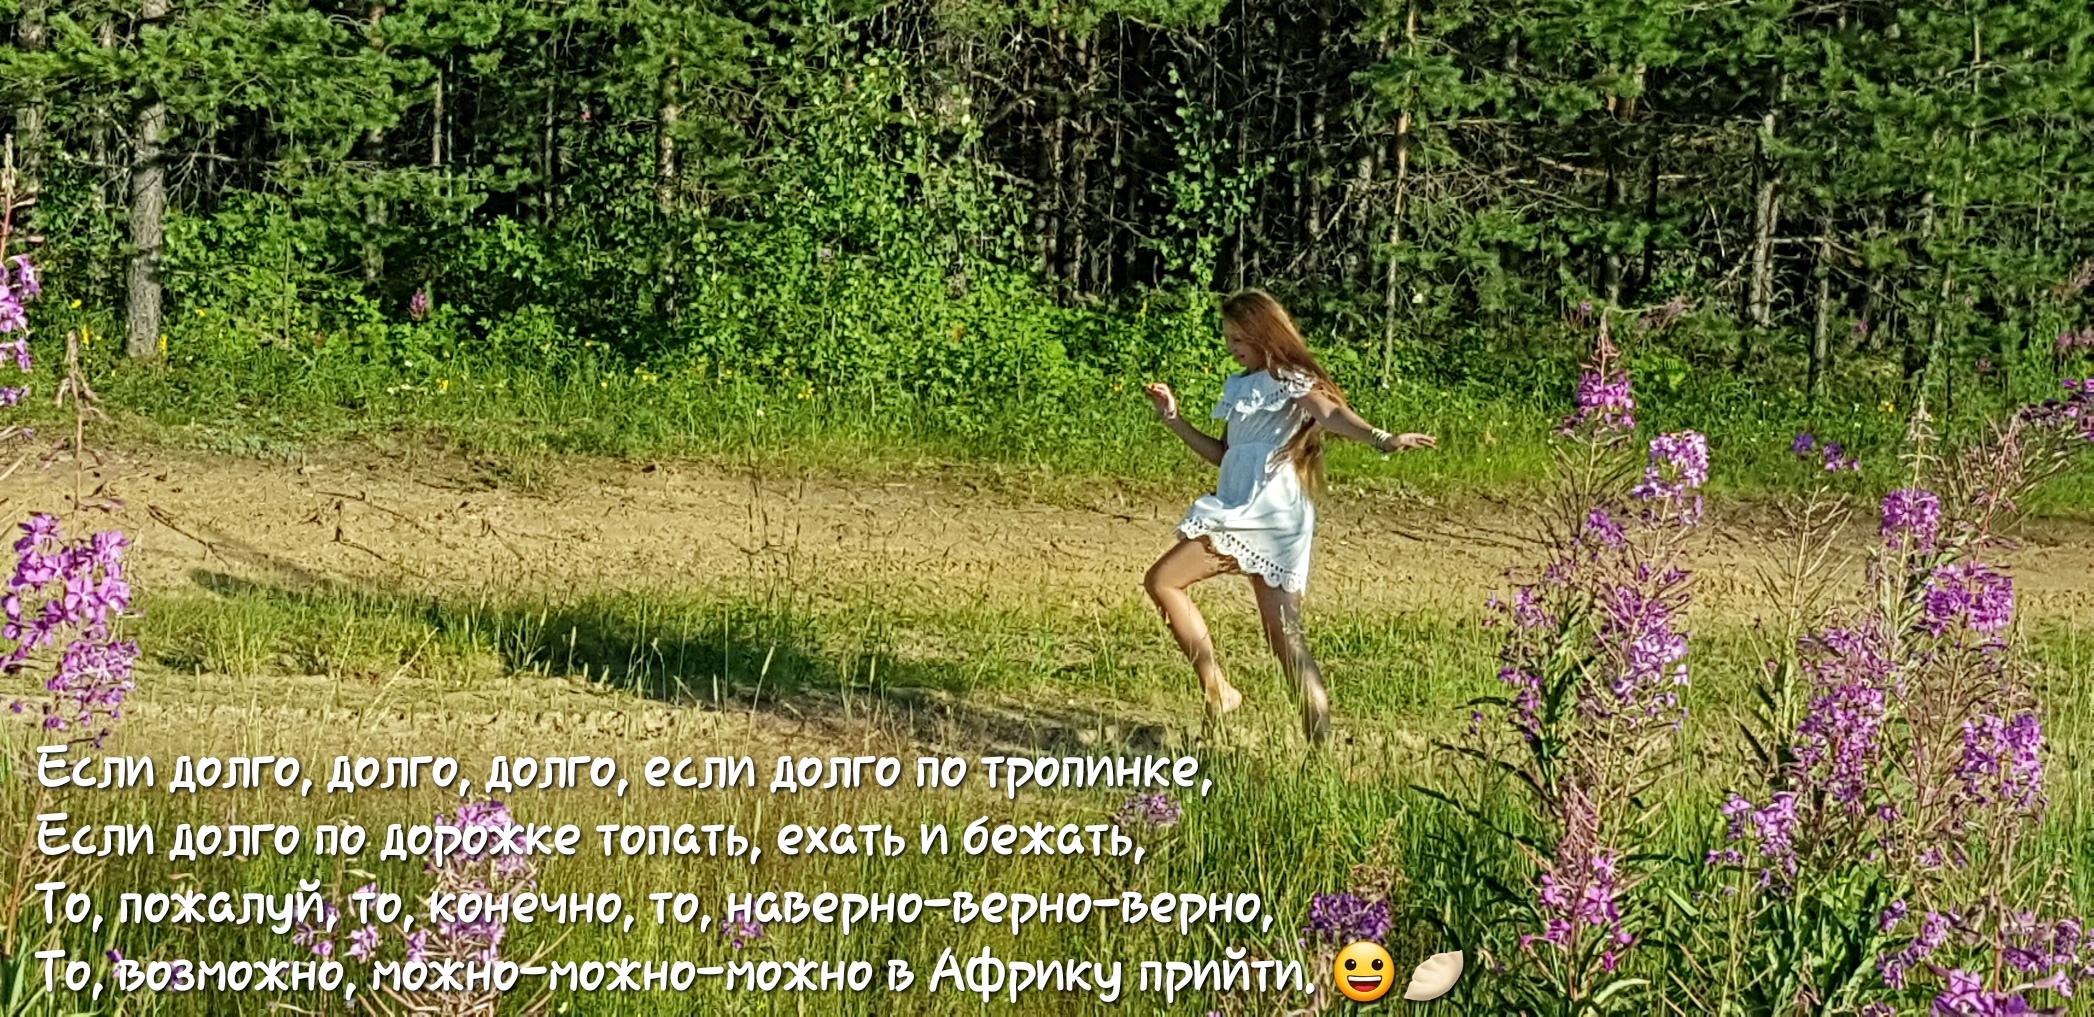 https://pp.userapi.com/c845020/v845020552/b78d3/Hx6LRwnwPJE.jpg